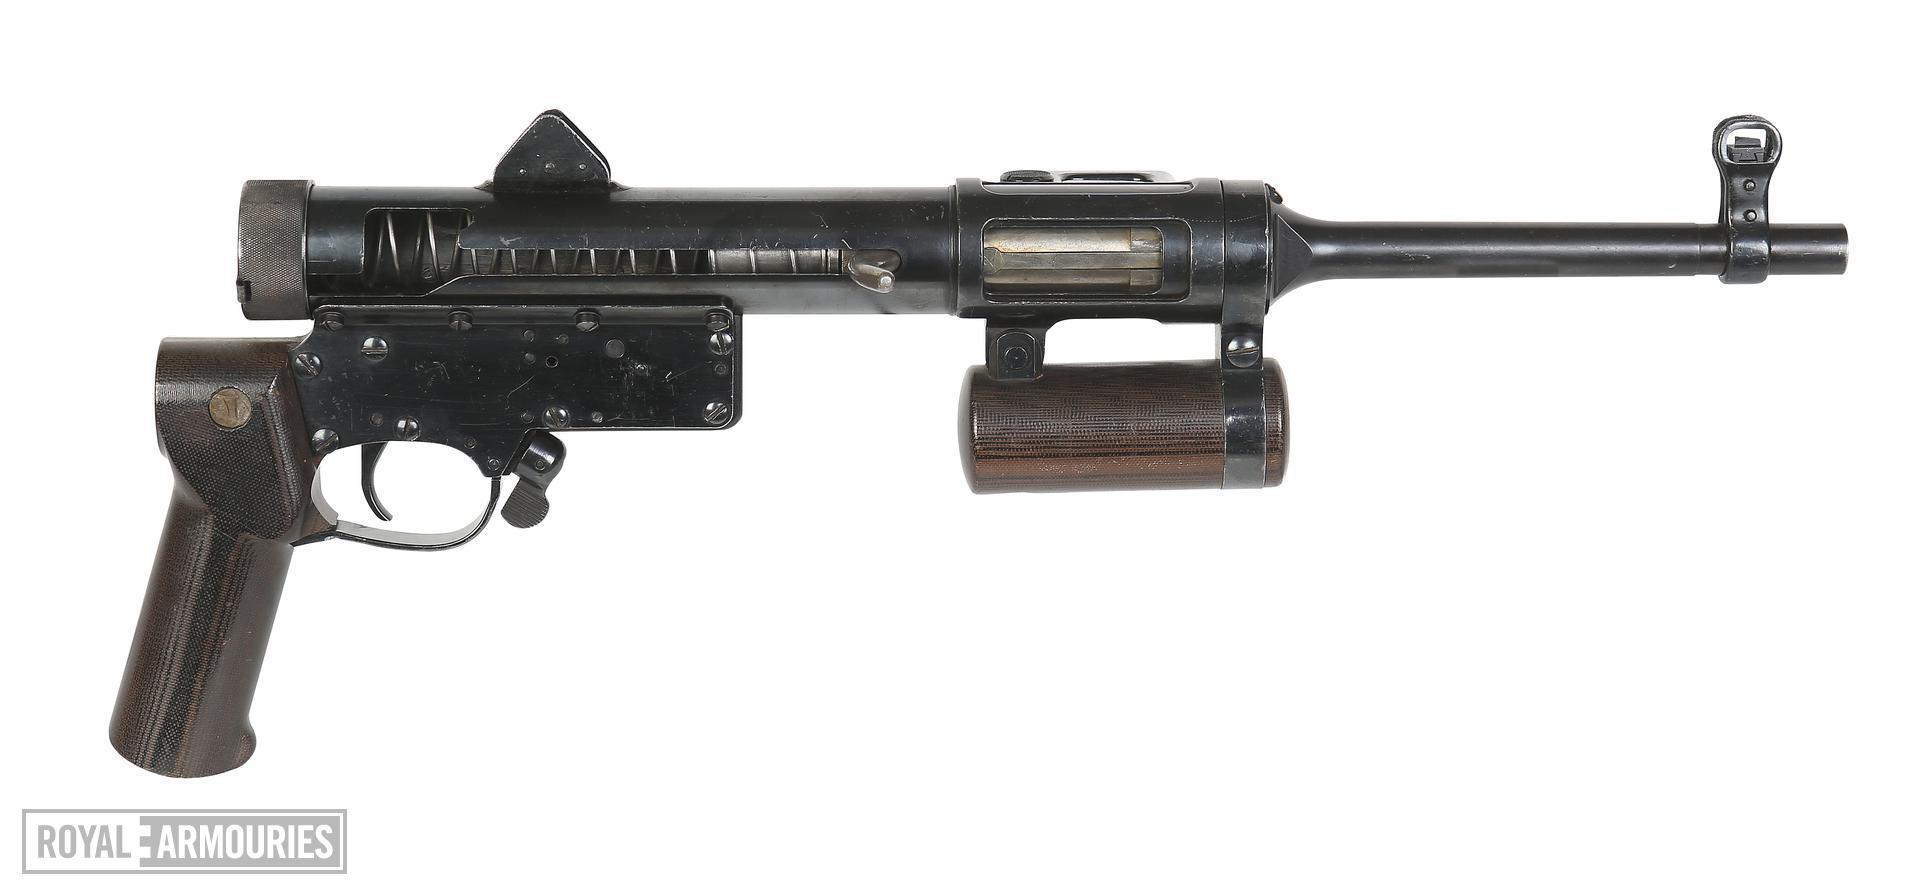 Centrefire automatic submachine gun - Lanchester light model 1 Experimental